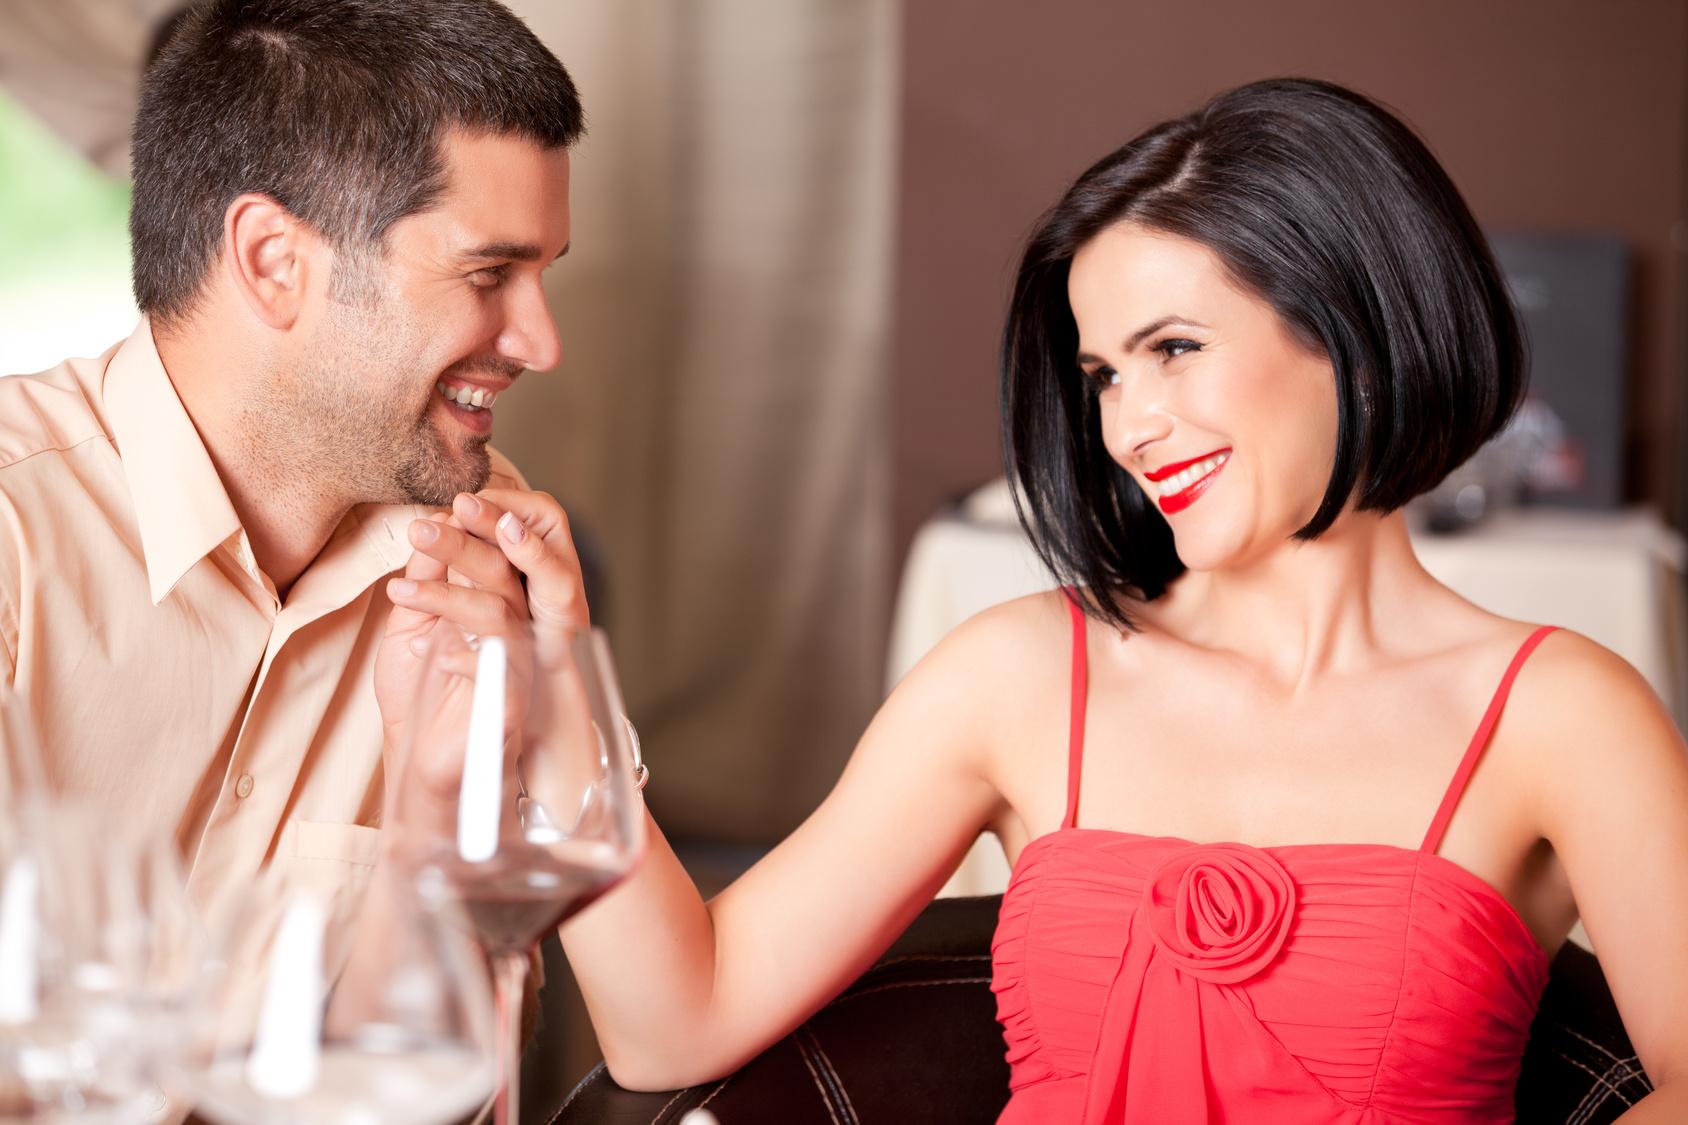 муж интересуется другими девушками на работе